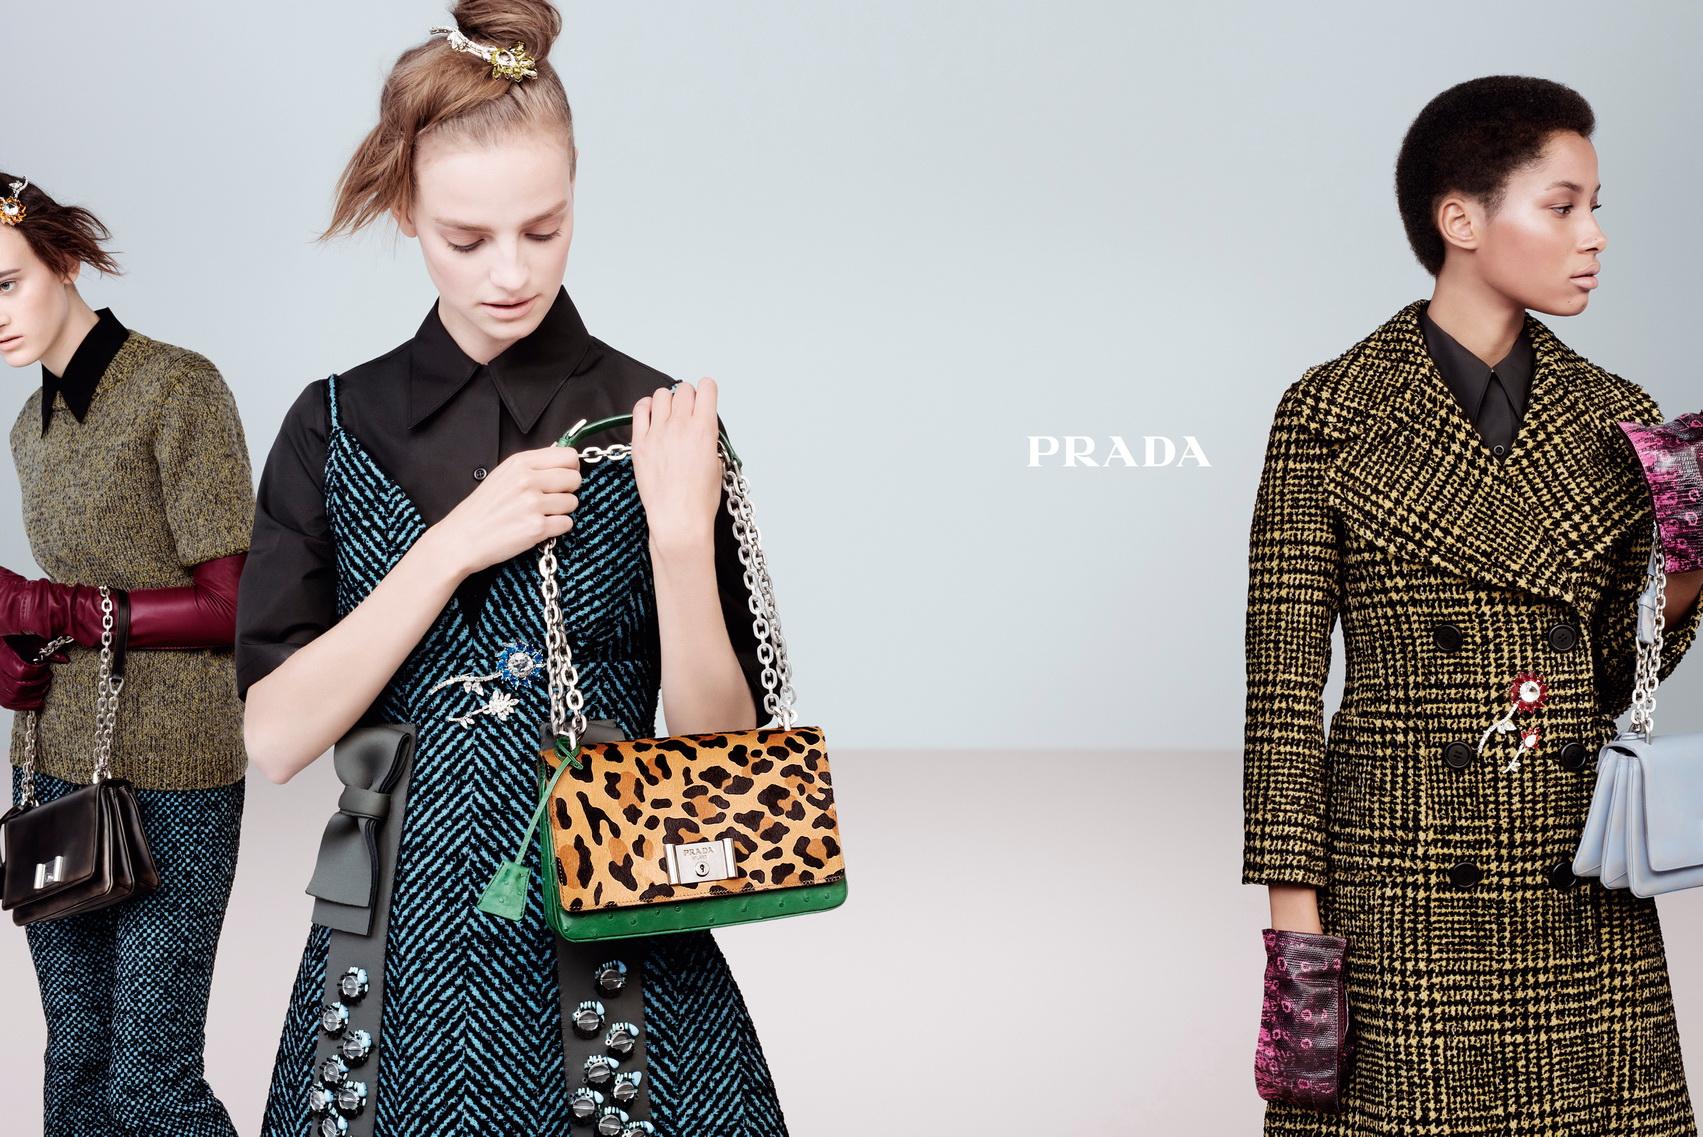 Prada-FW15-Womenswear-Adv-Campaign-image_04